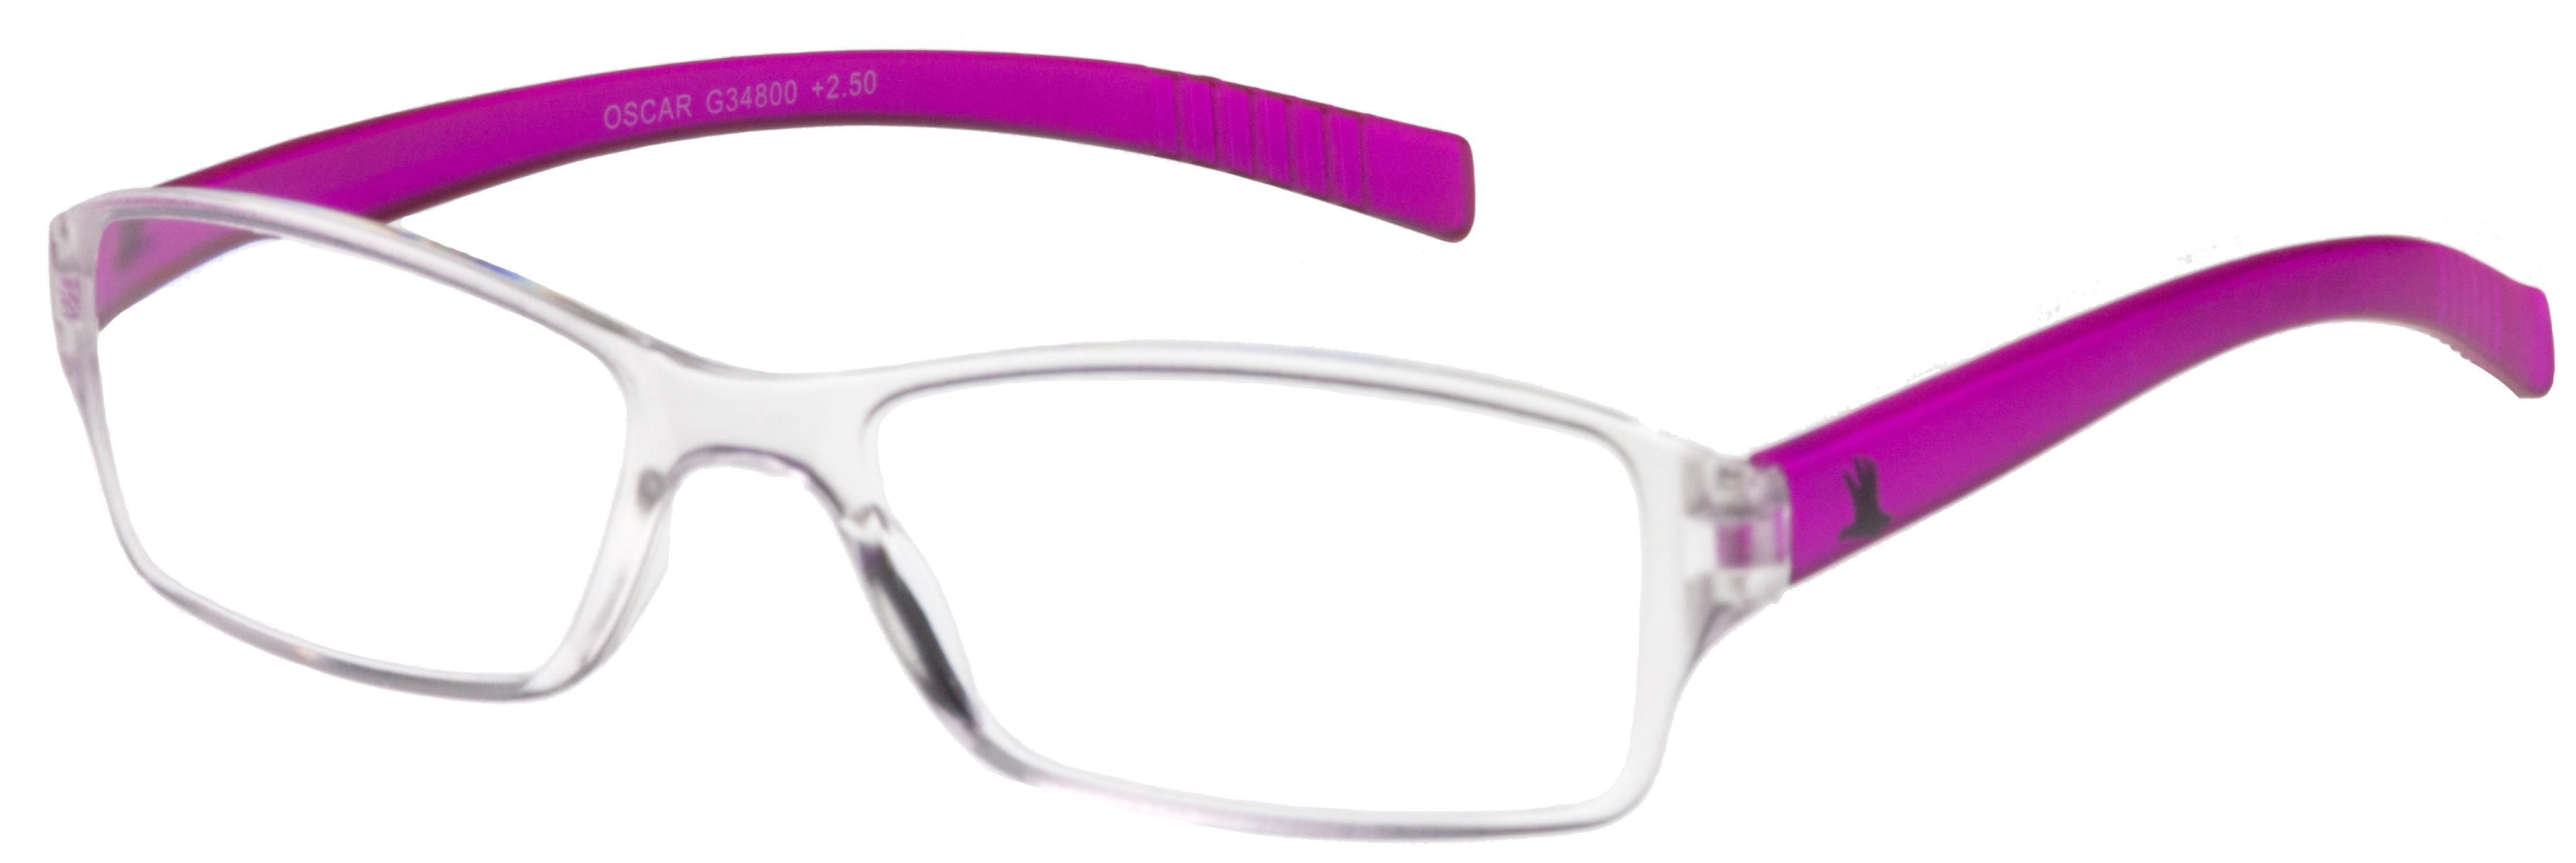 Damen Lesebrille I NEED YOU Lesehilfe OSCAR pink INY-348XX